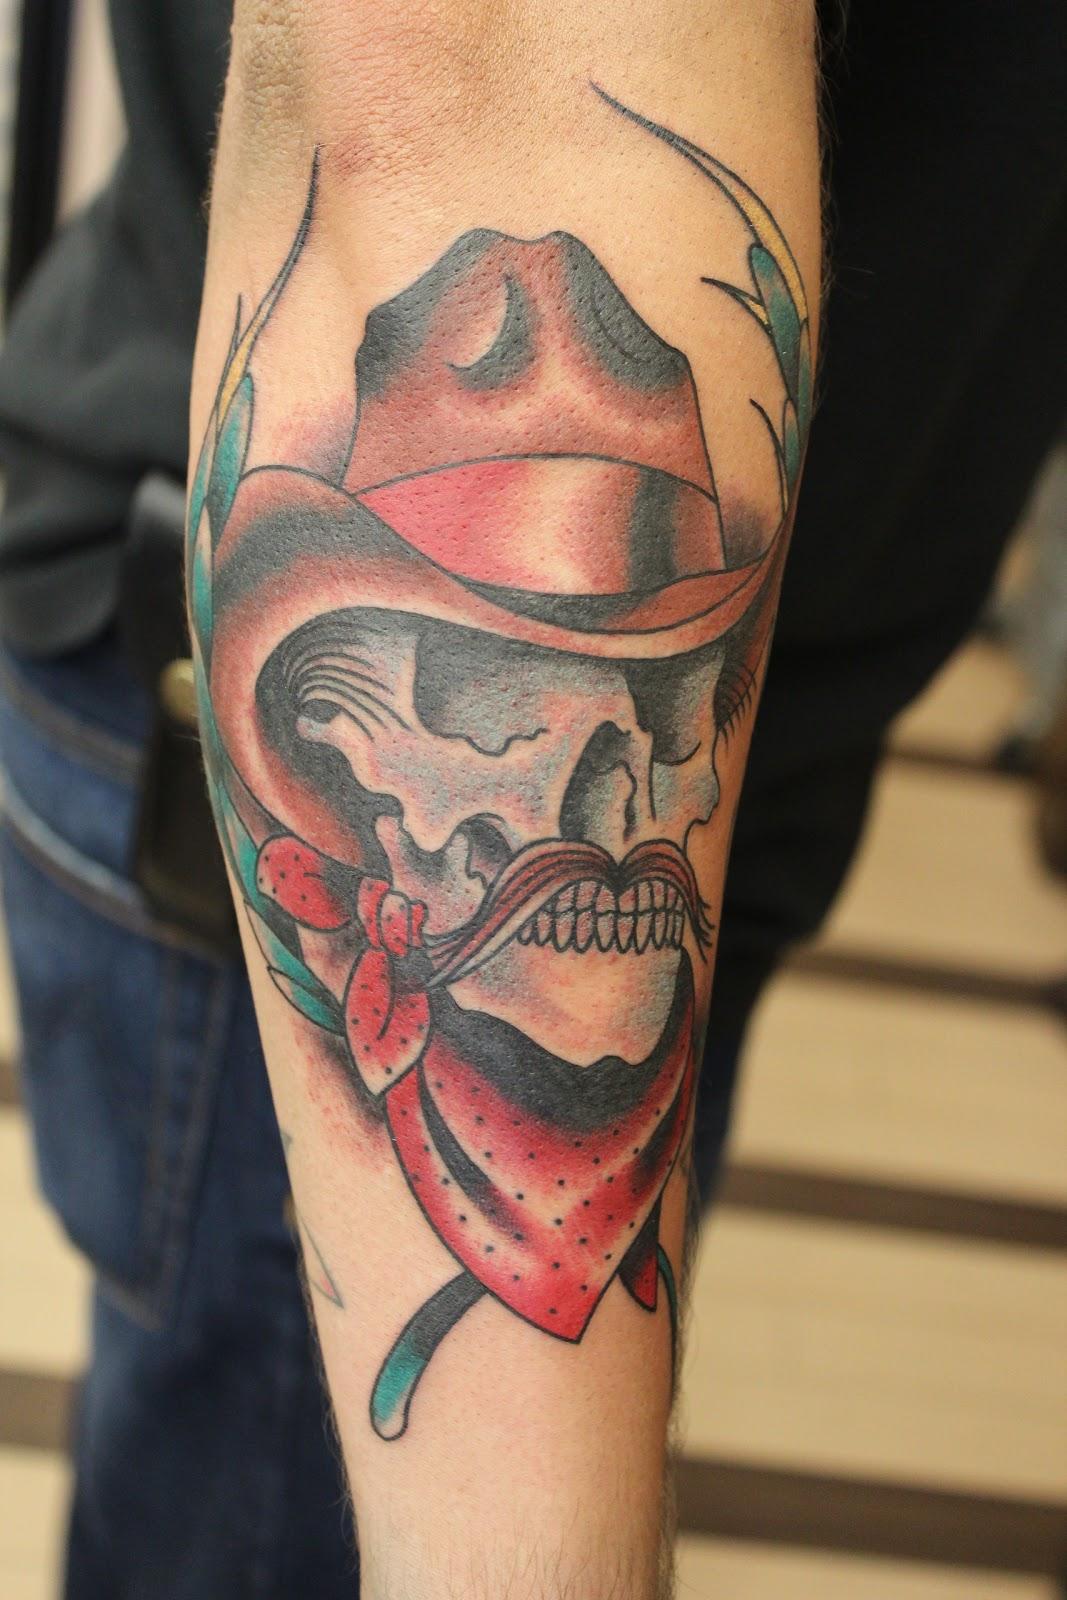 Cowboy Skull Tattoo By Buddy Holiday At Downtown Tattoo Las